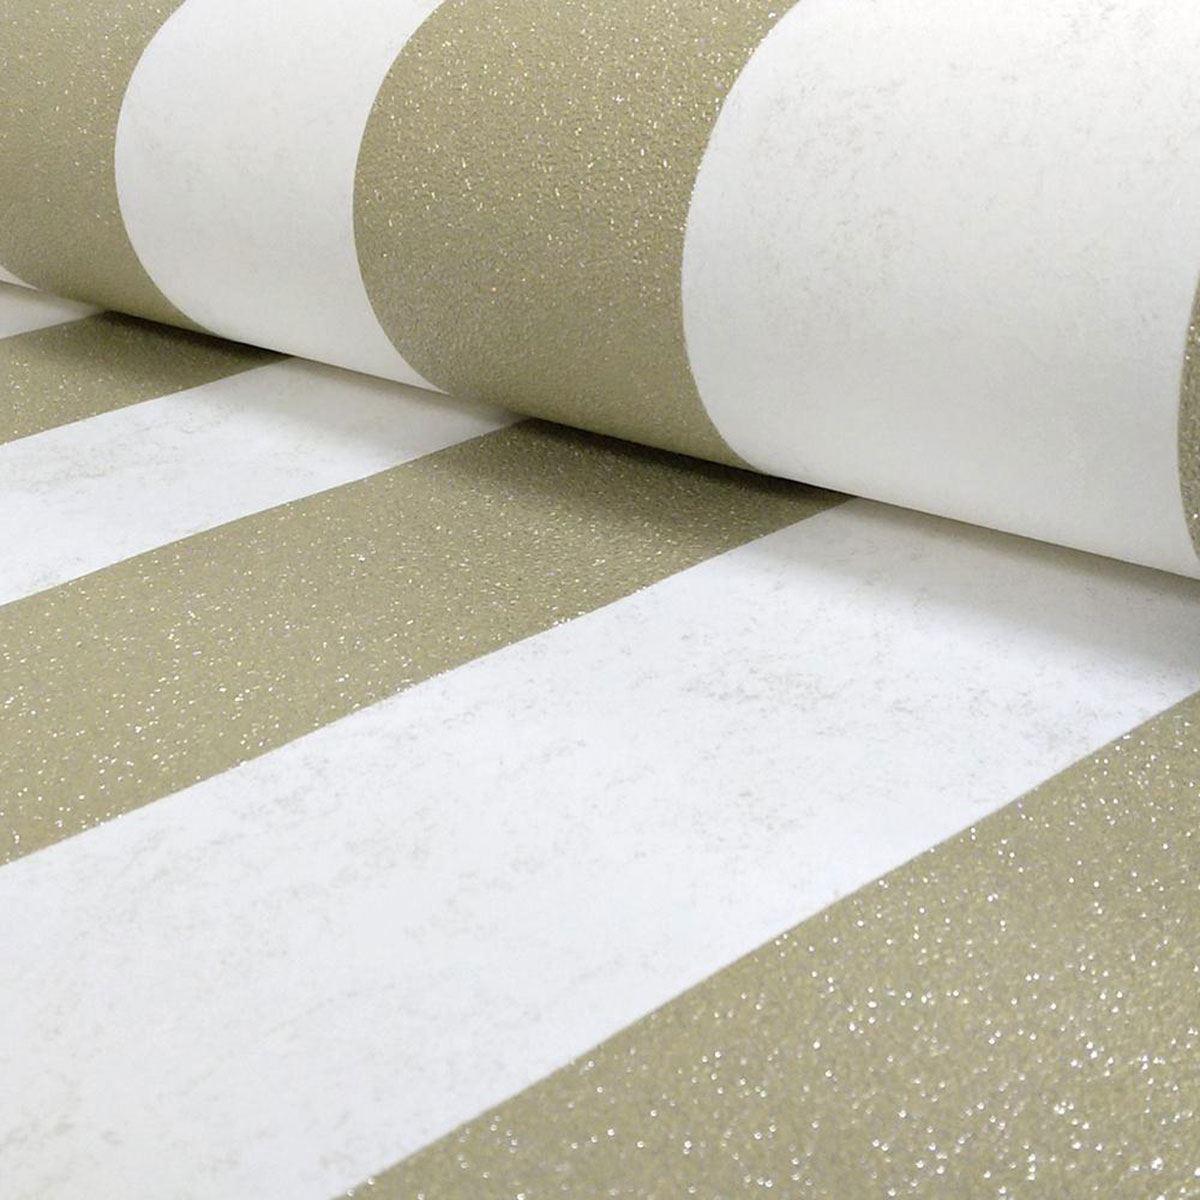 Silver Bedroom Wallpaper Pamps Carat Glitter Stripe Wallpaper Black Cream Silver Gold